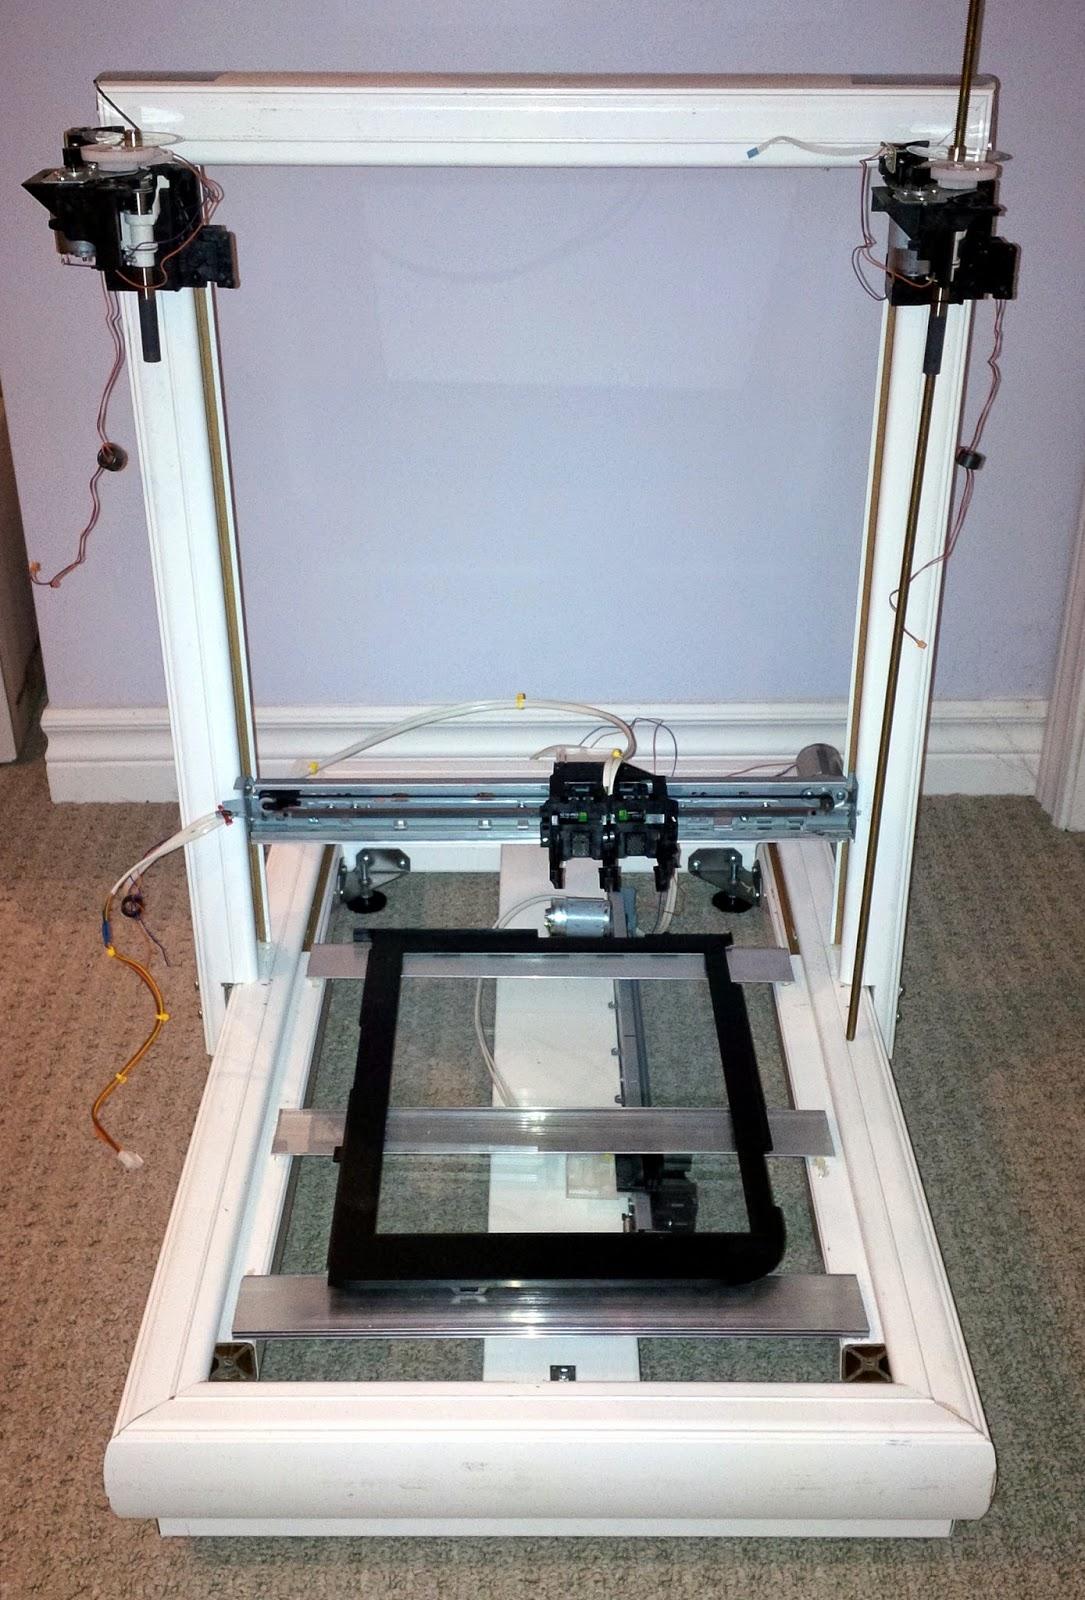 Arduino-Pi Ramblings: Further Progress On Framing My